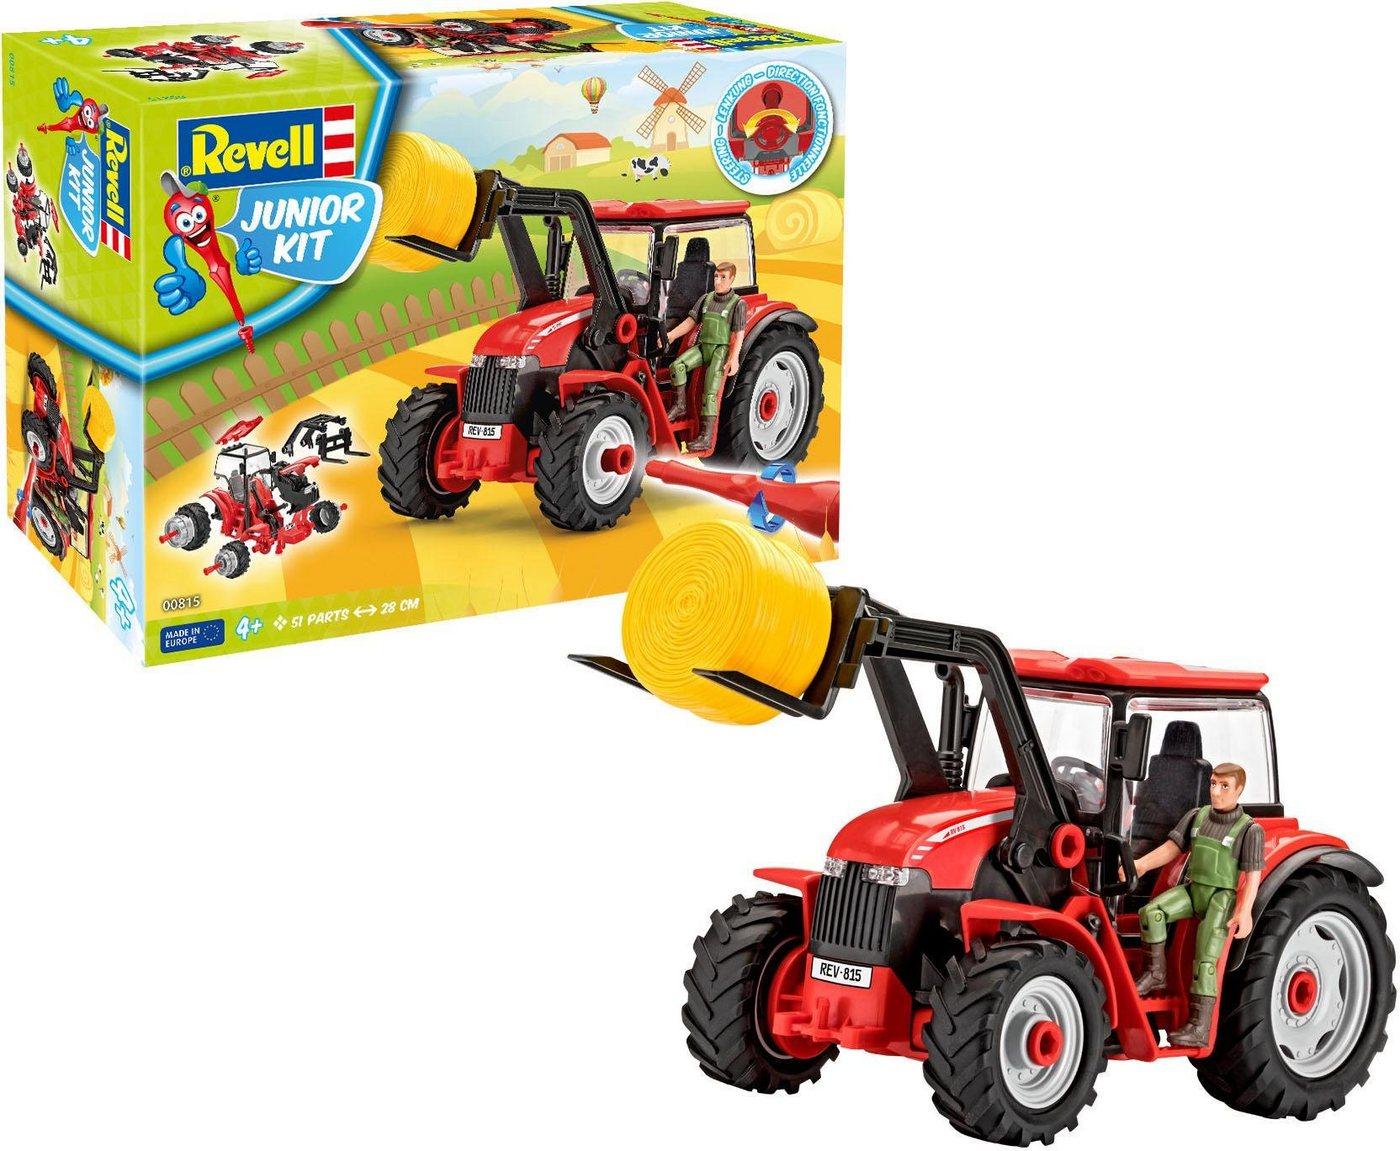 Revell Modellbausatz, »Junior Kit Traktor & Lader, rot mit Figur«